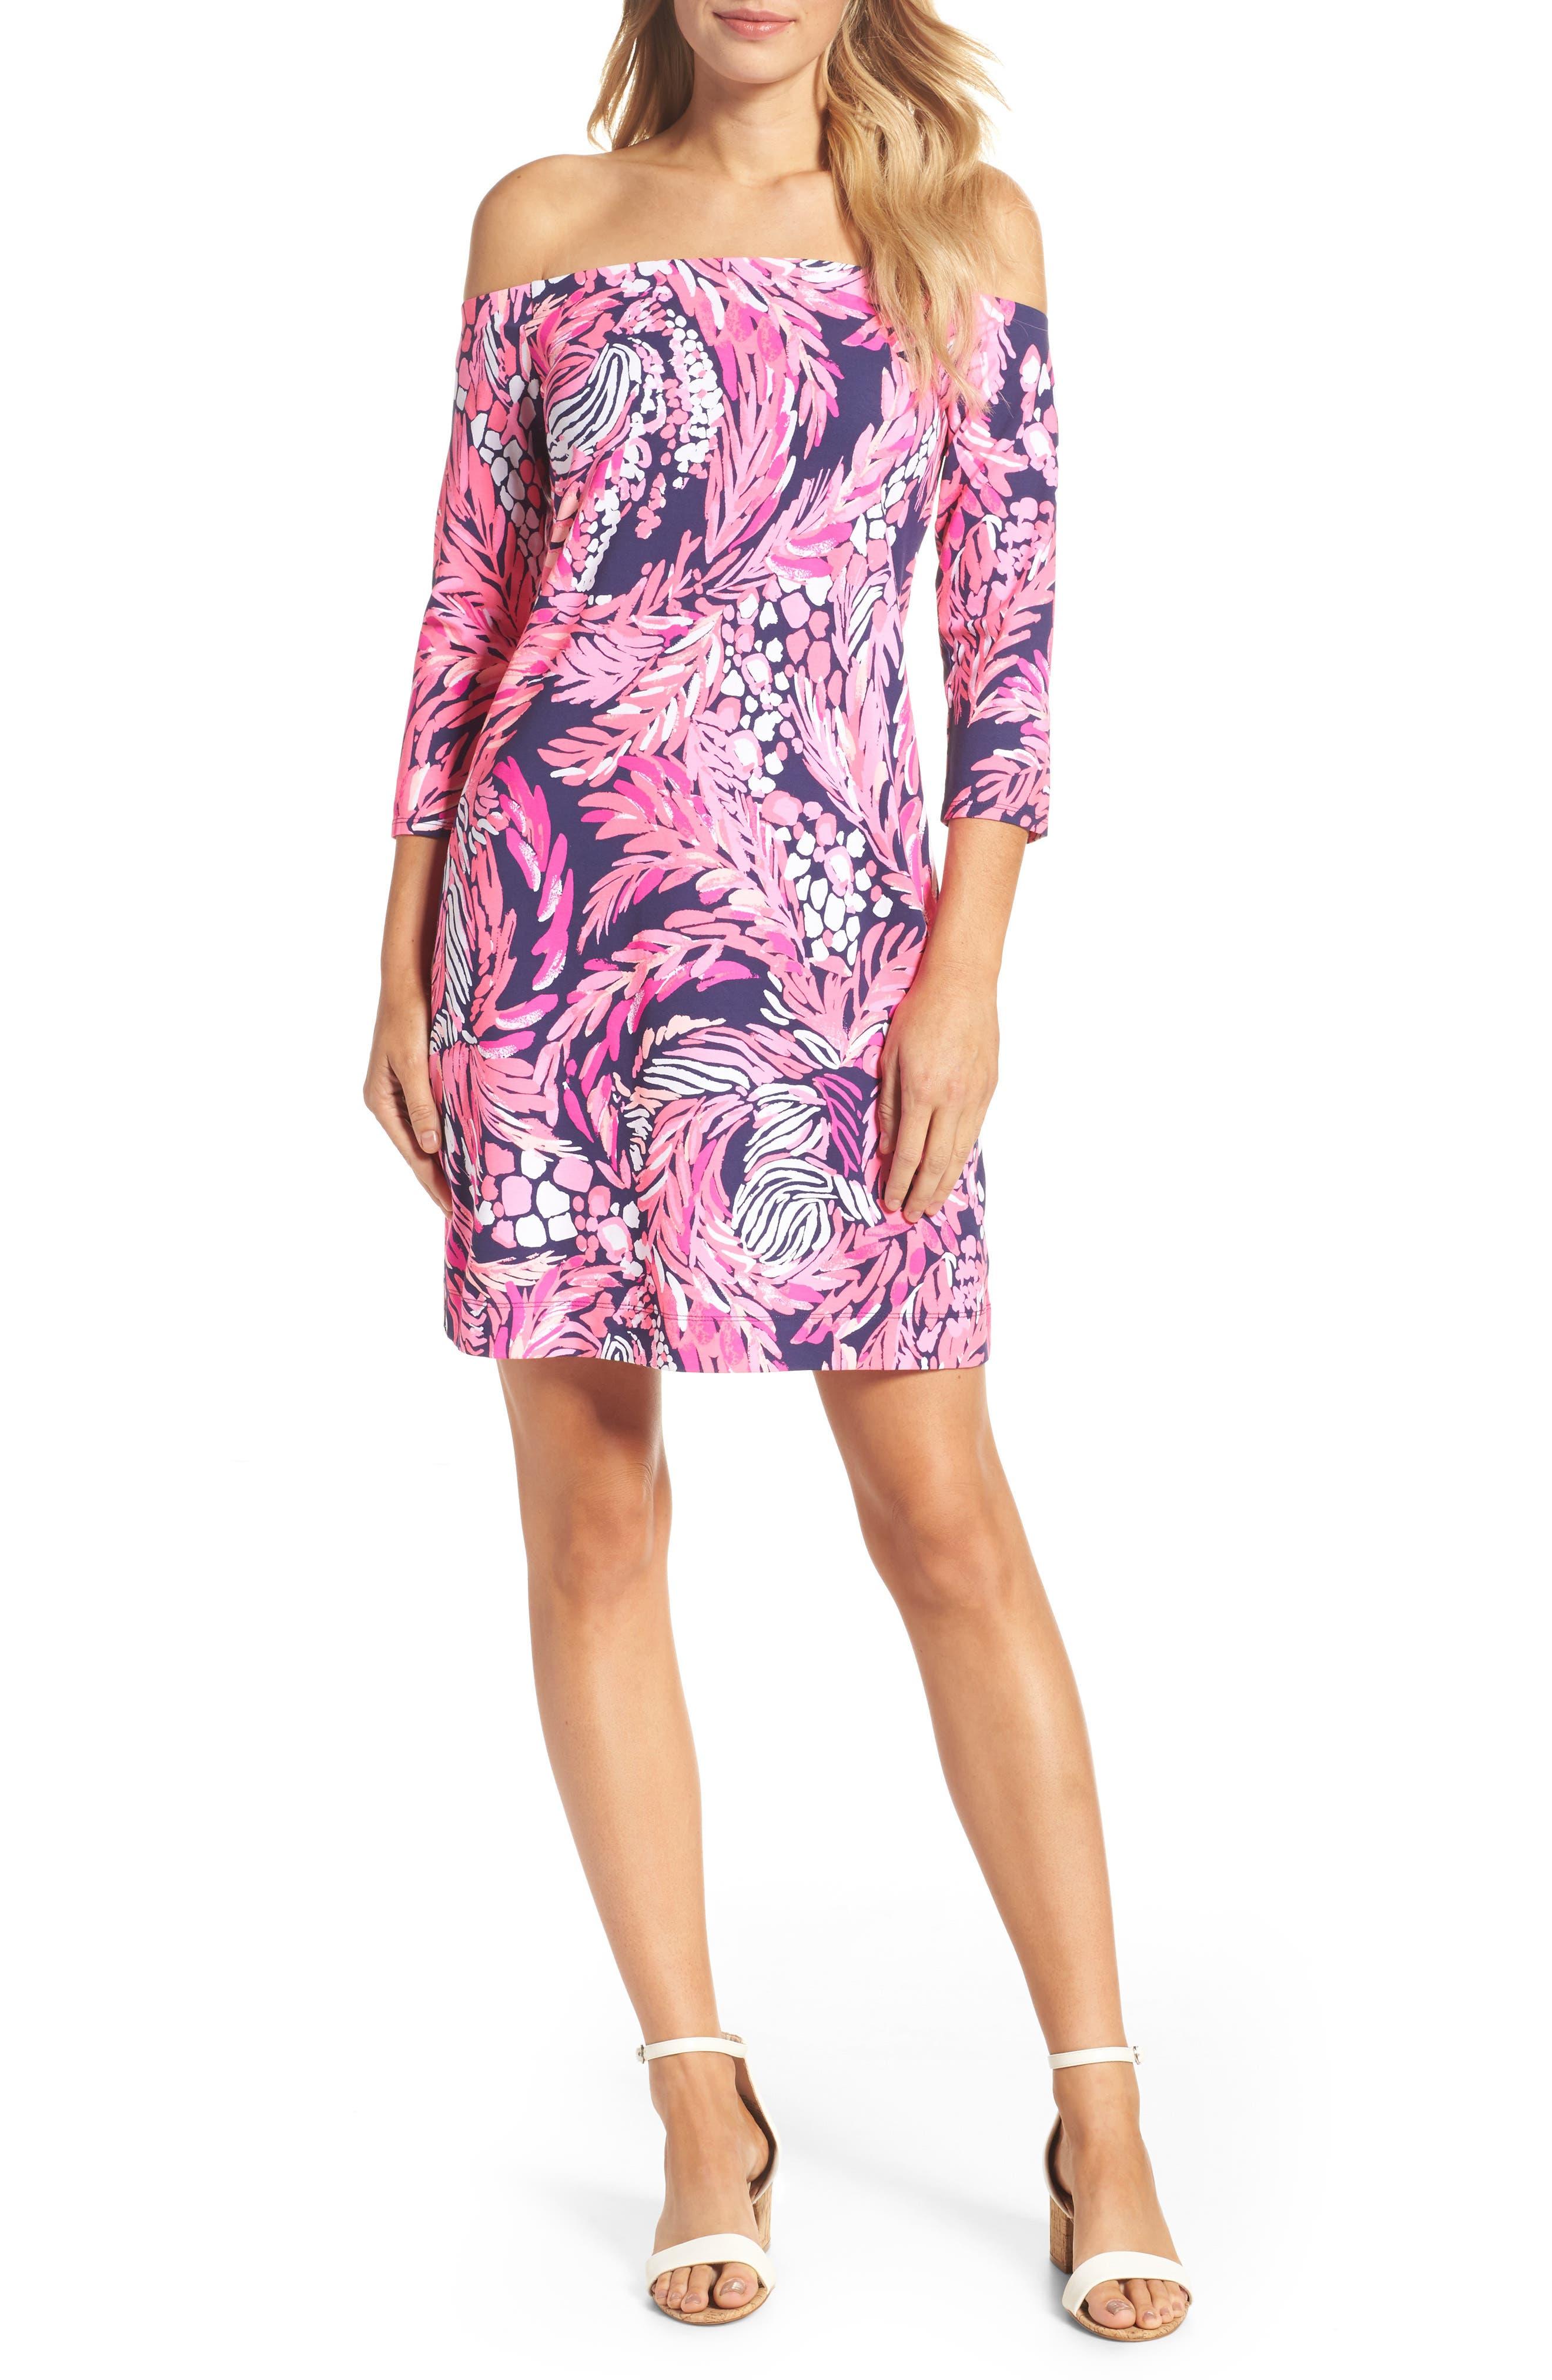 Laurana Off the Shoulder Sheath Dress,                         Main,                         color, 650